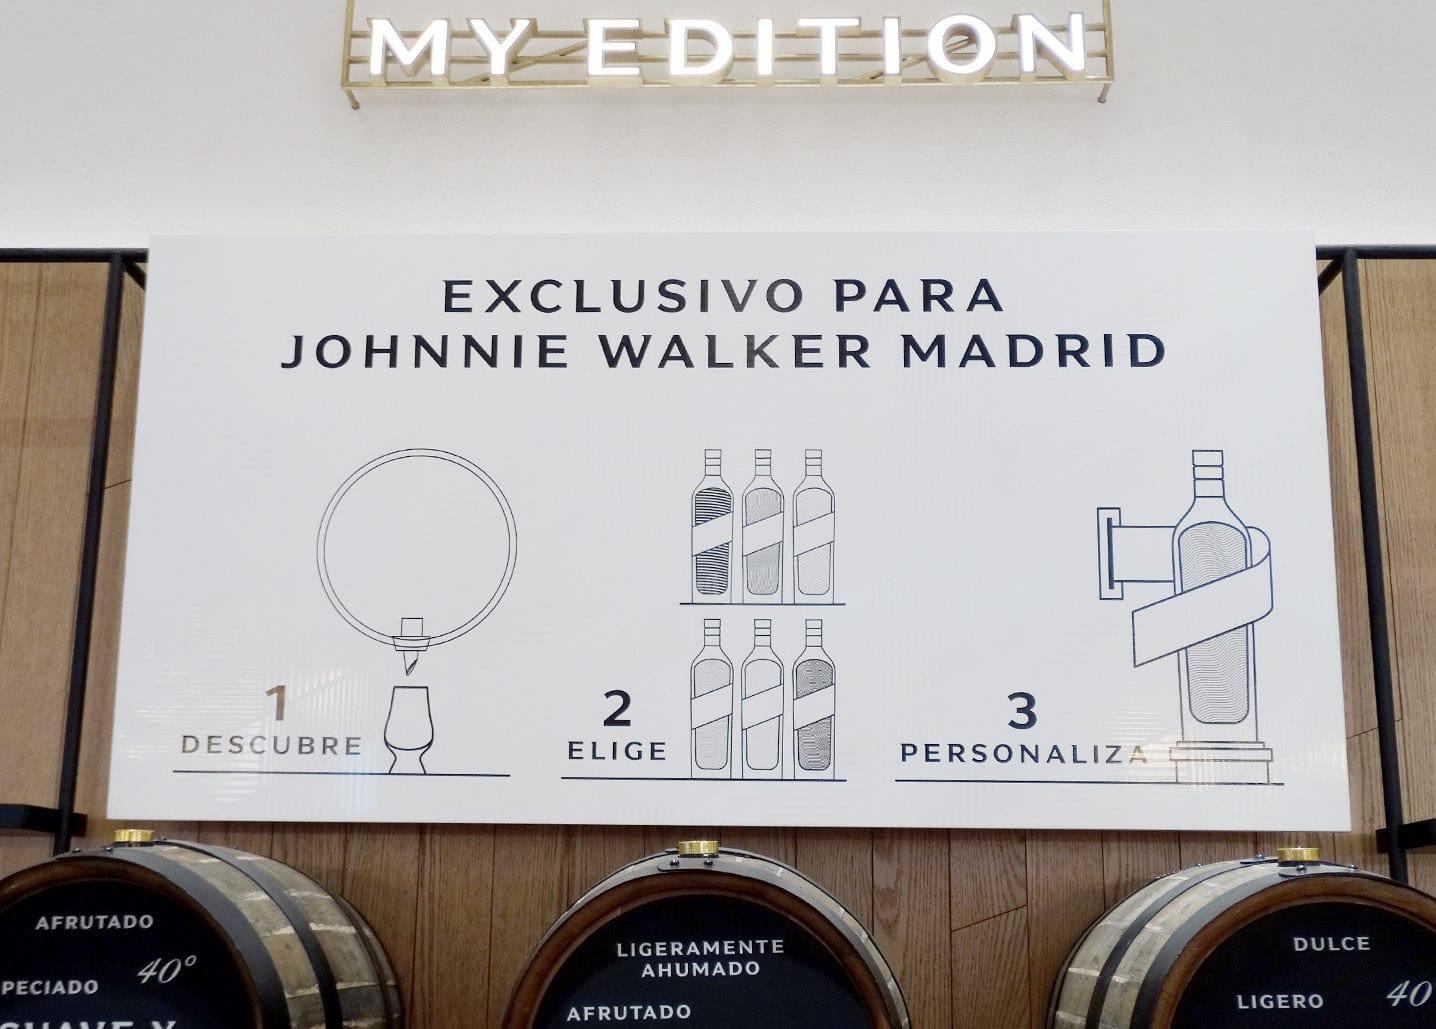 Tienda Johnnie Walker Madrid - Todo Whisky